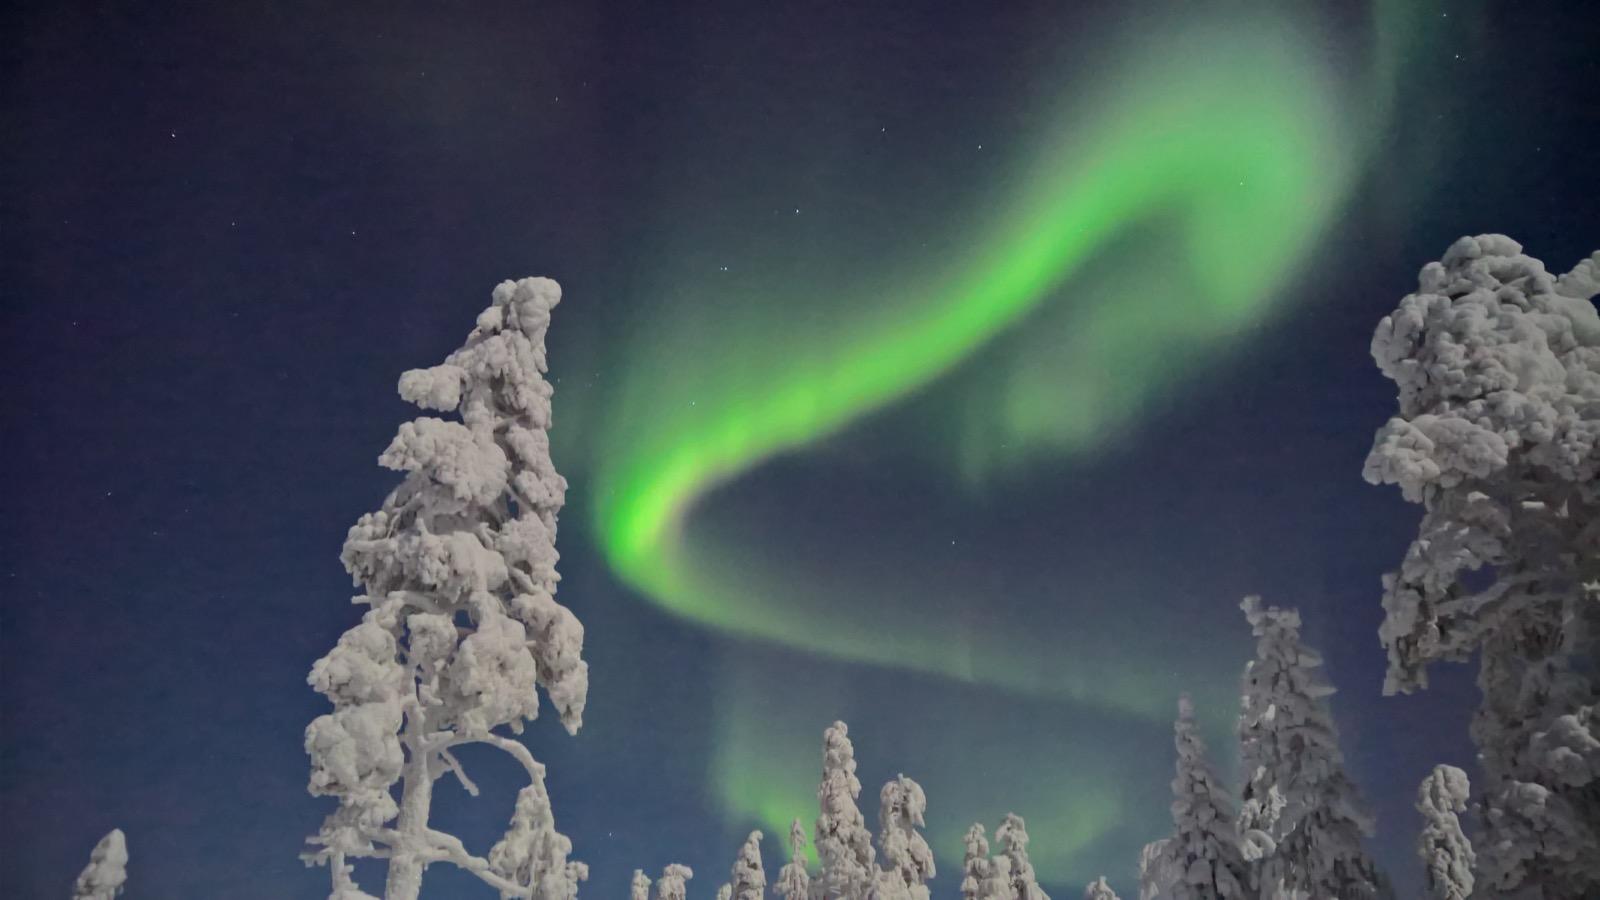 Shooting The Aurora Borealis On A Smartphone